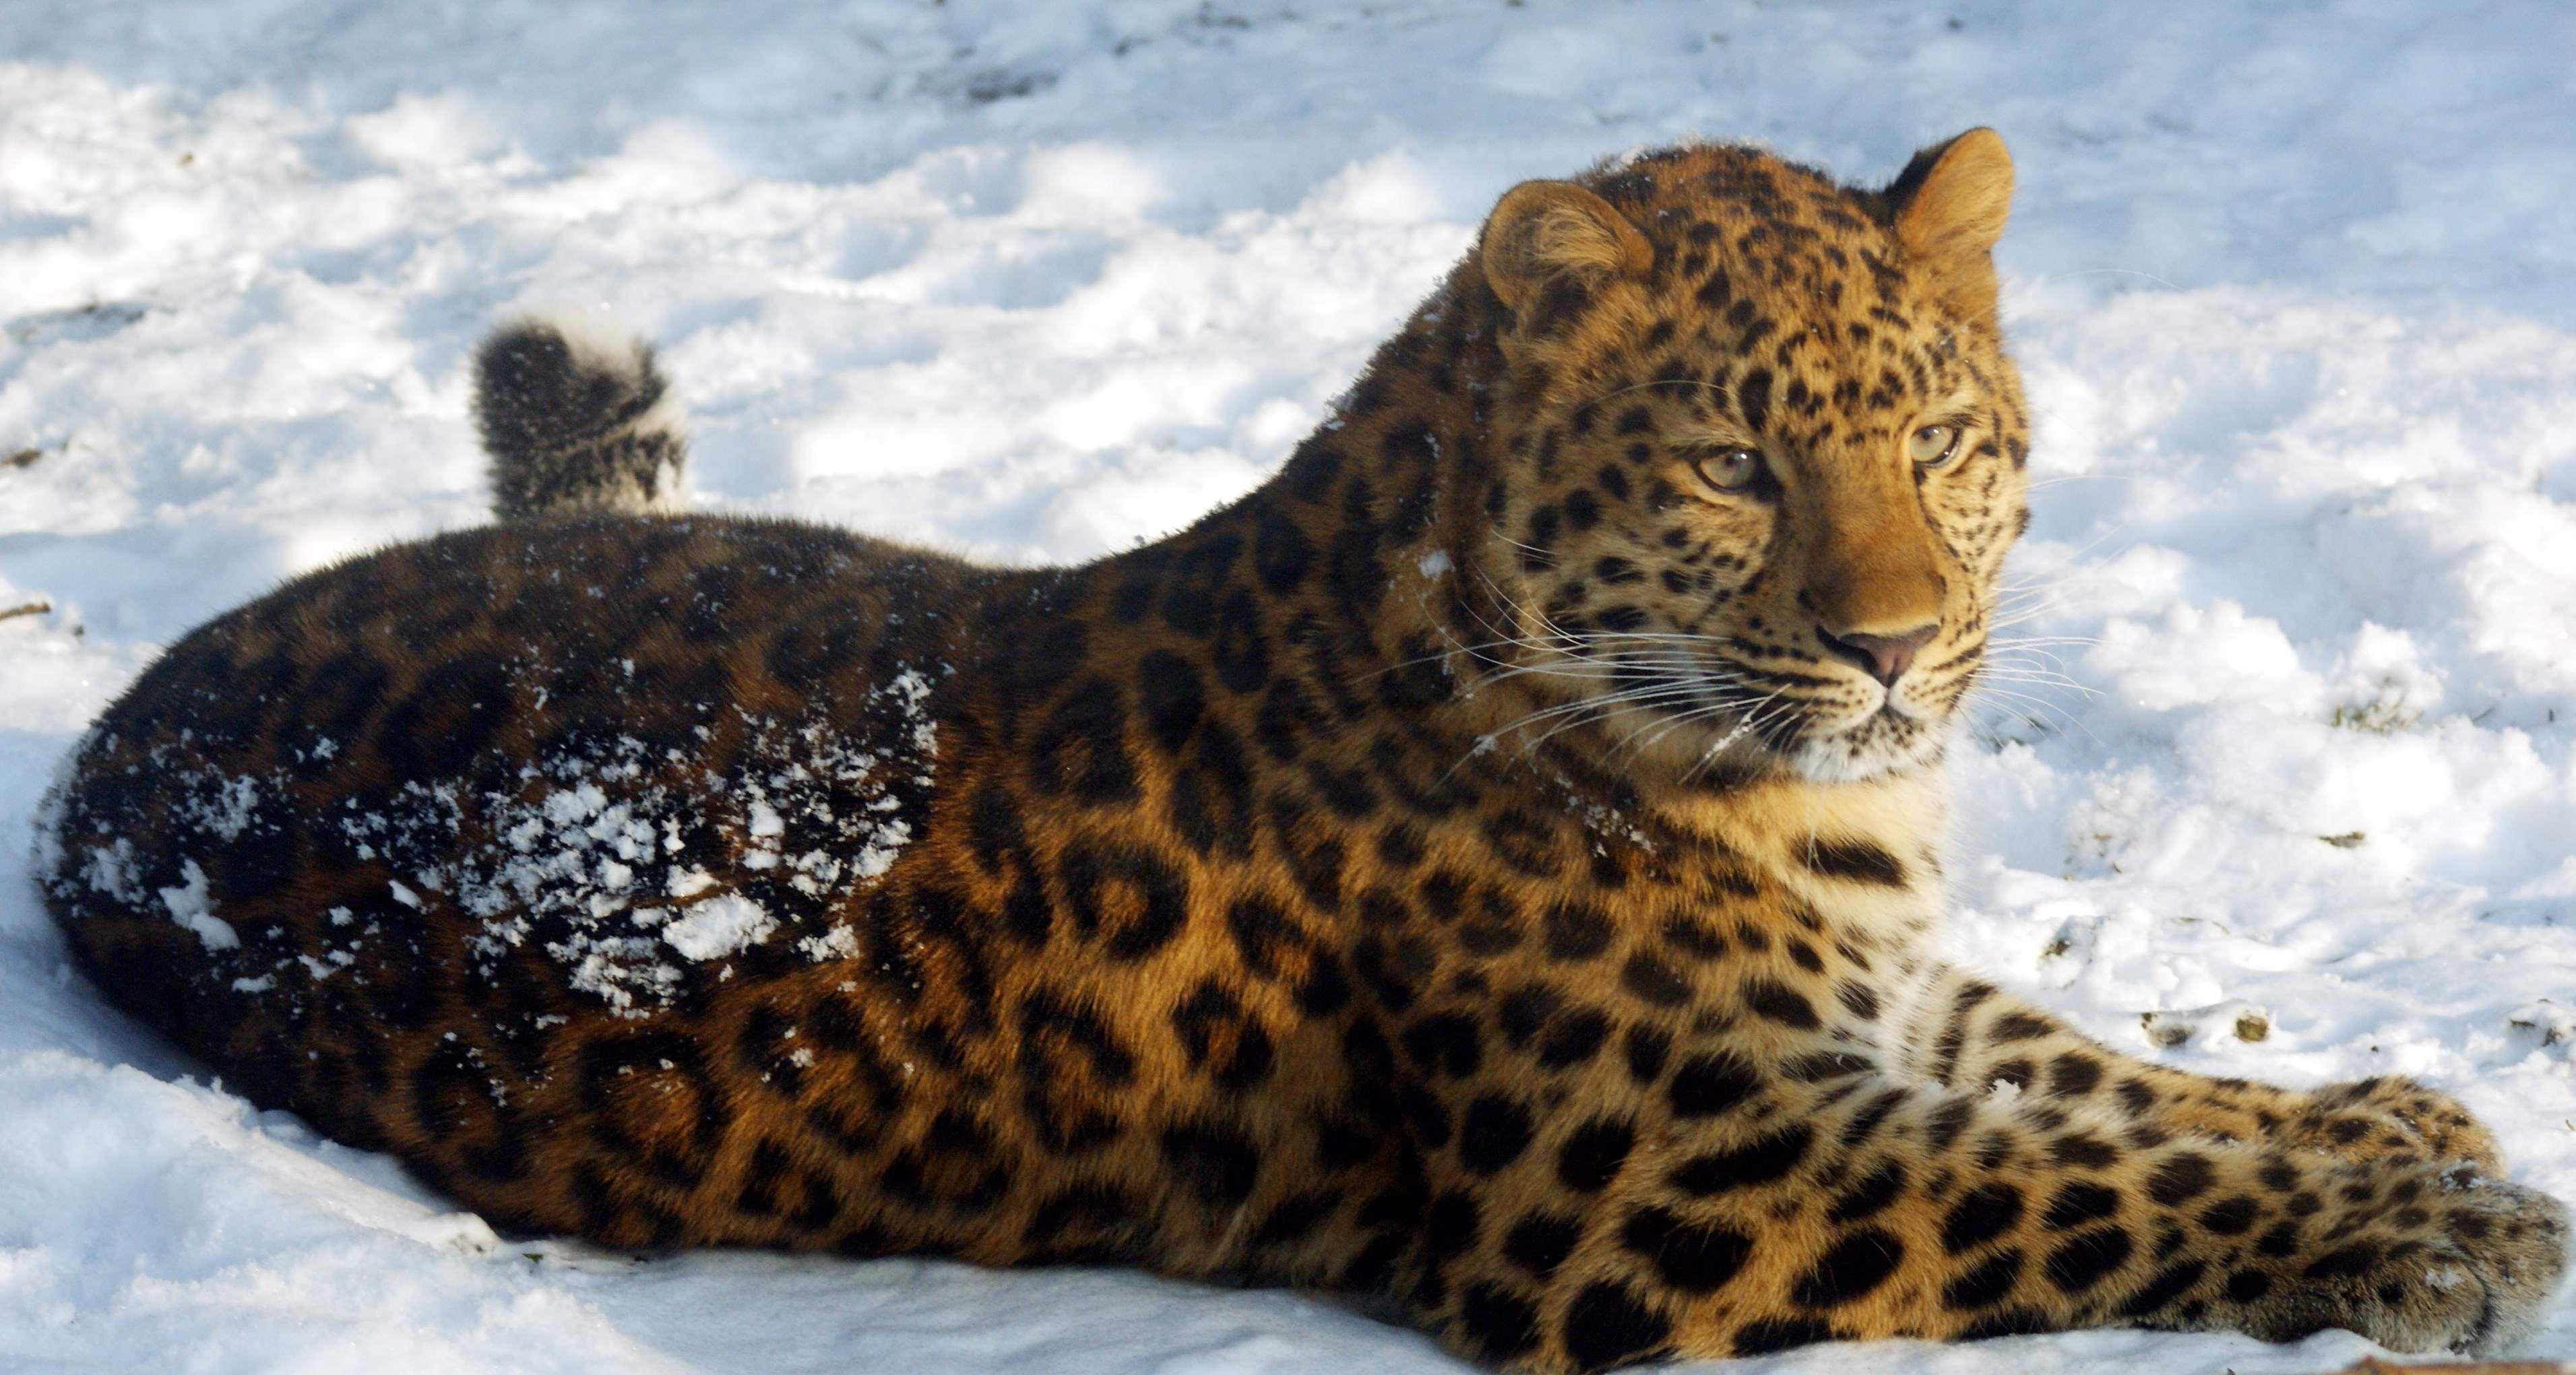 amur leopard ~ highly endangered | glorious beasts | pinterest